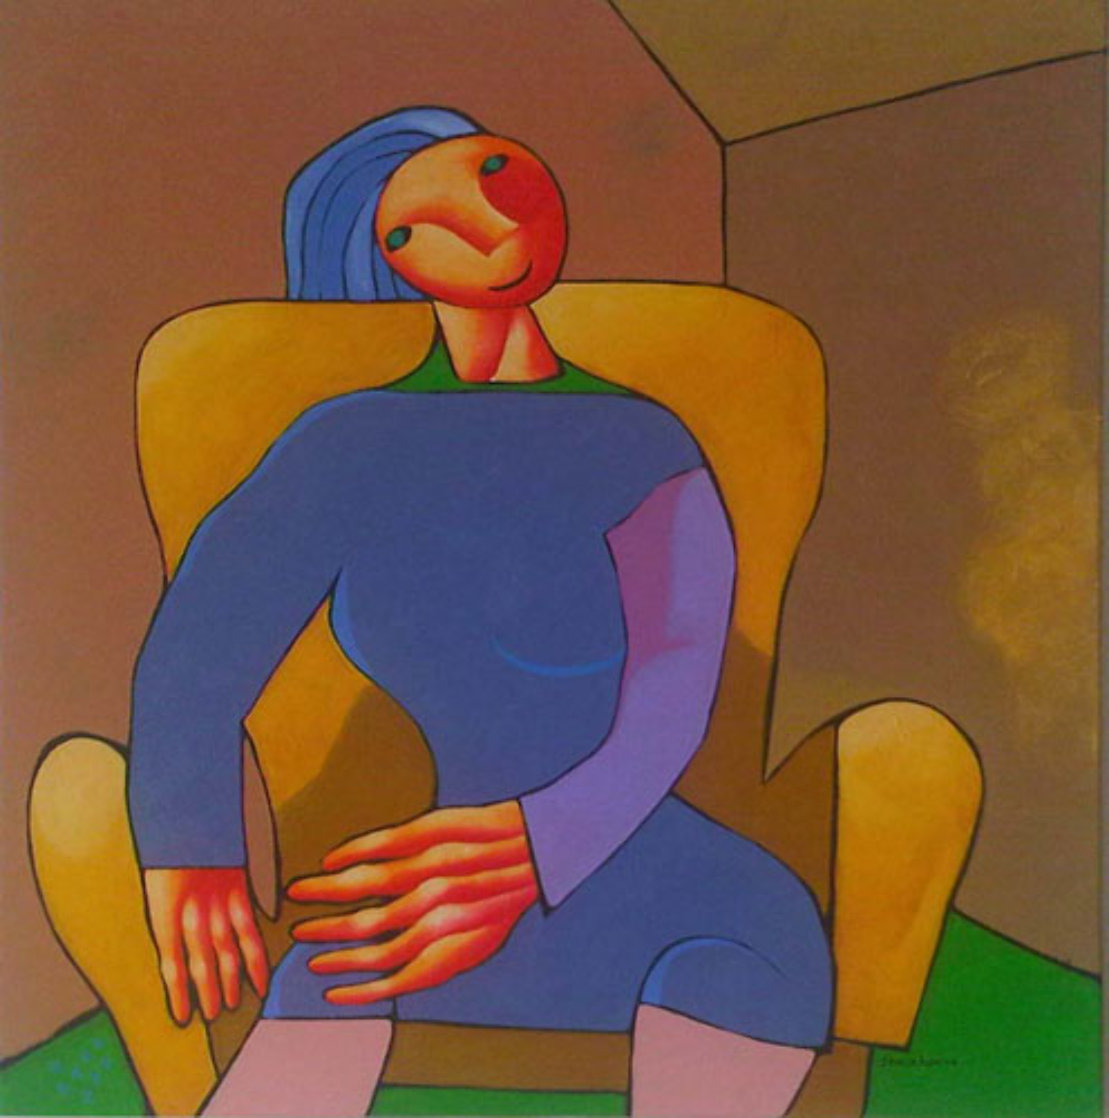 Portrait of Precise Woman 2006 43x37 Super Huge Original Painting by Dimitri Strizhov